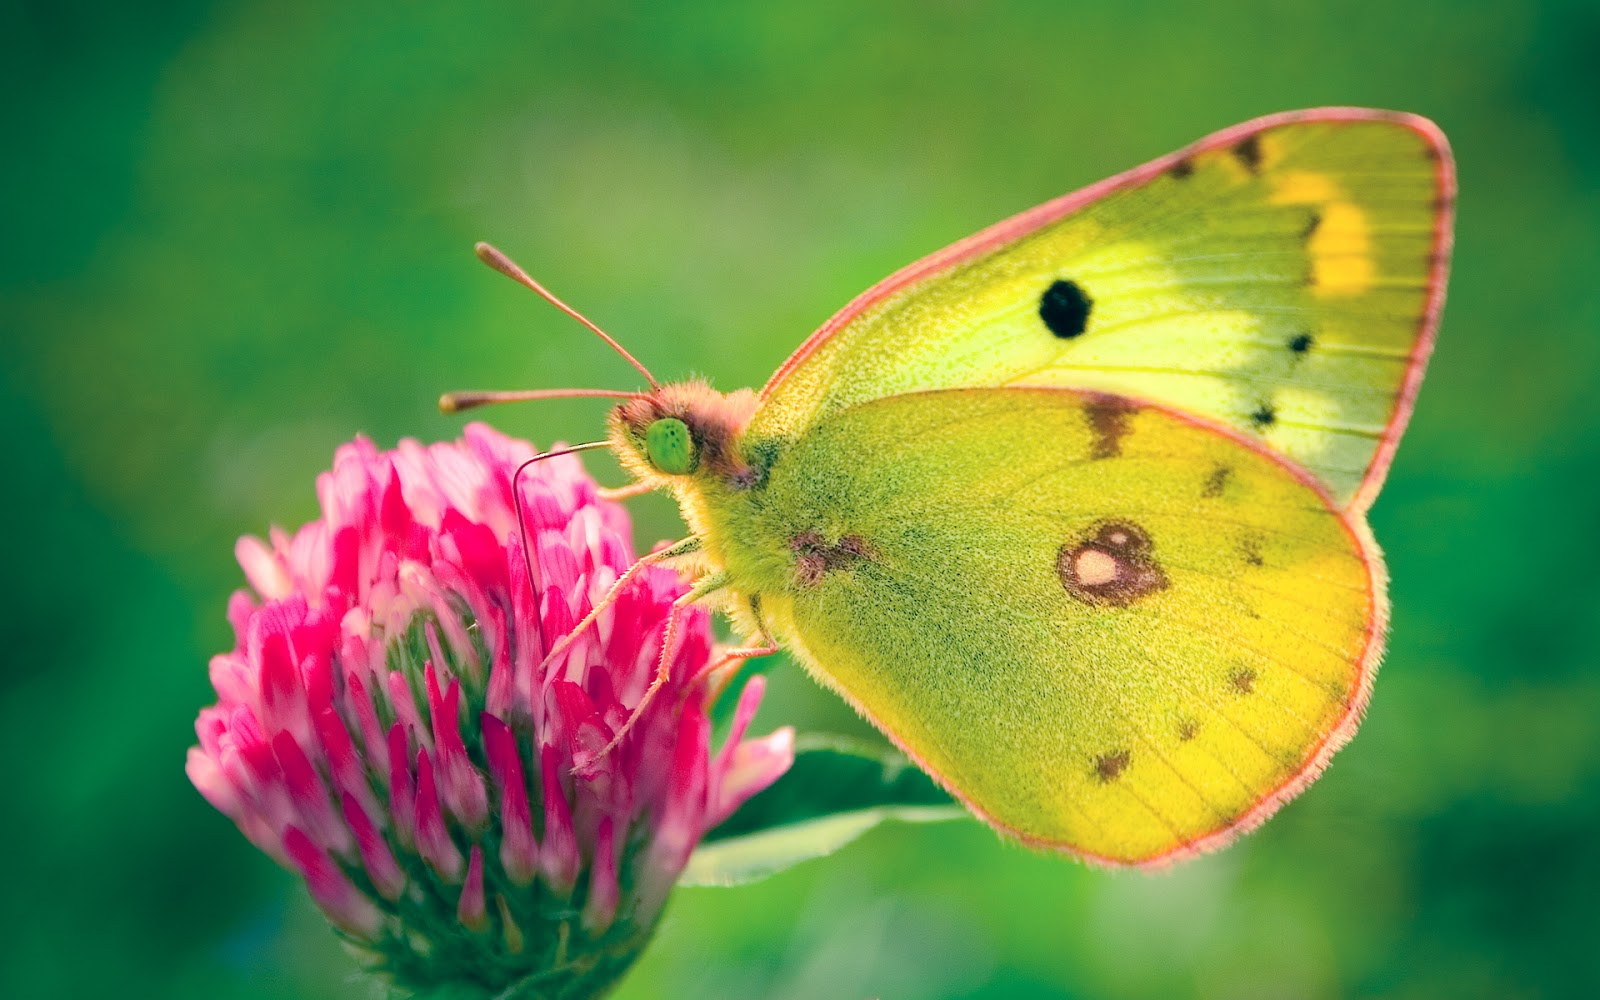 beautiful hd butterfly wallpapers